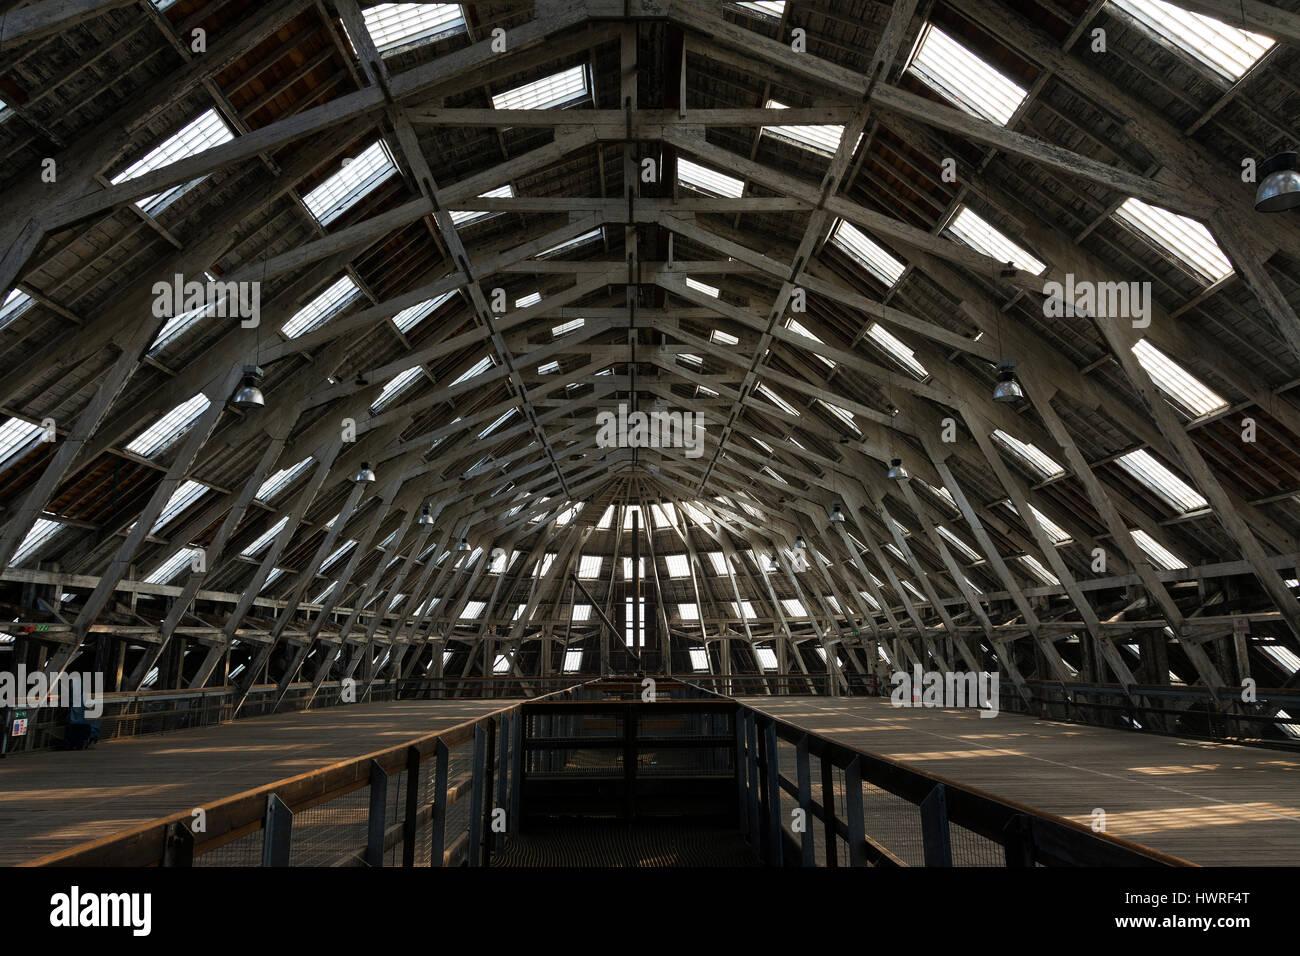 The rope making factory at Chatham historic dockyard, Kent, UK - Stock Image